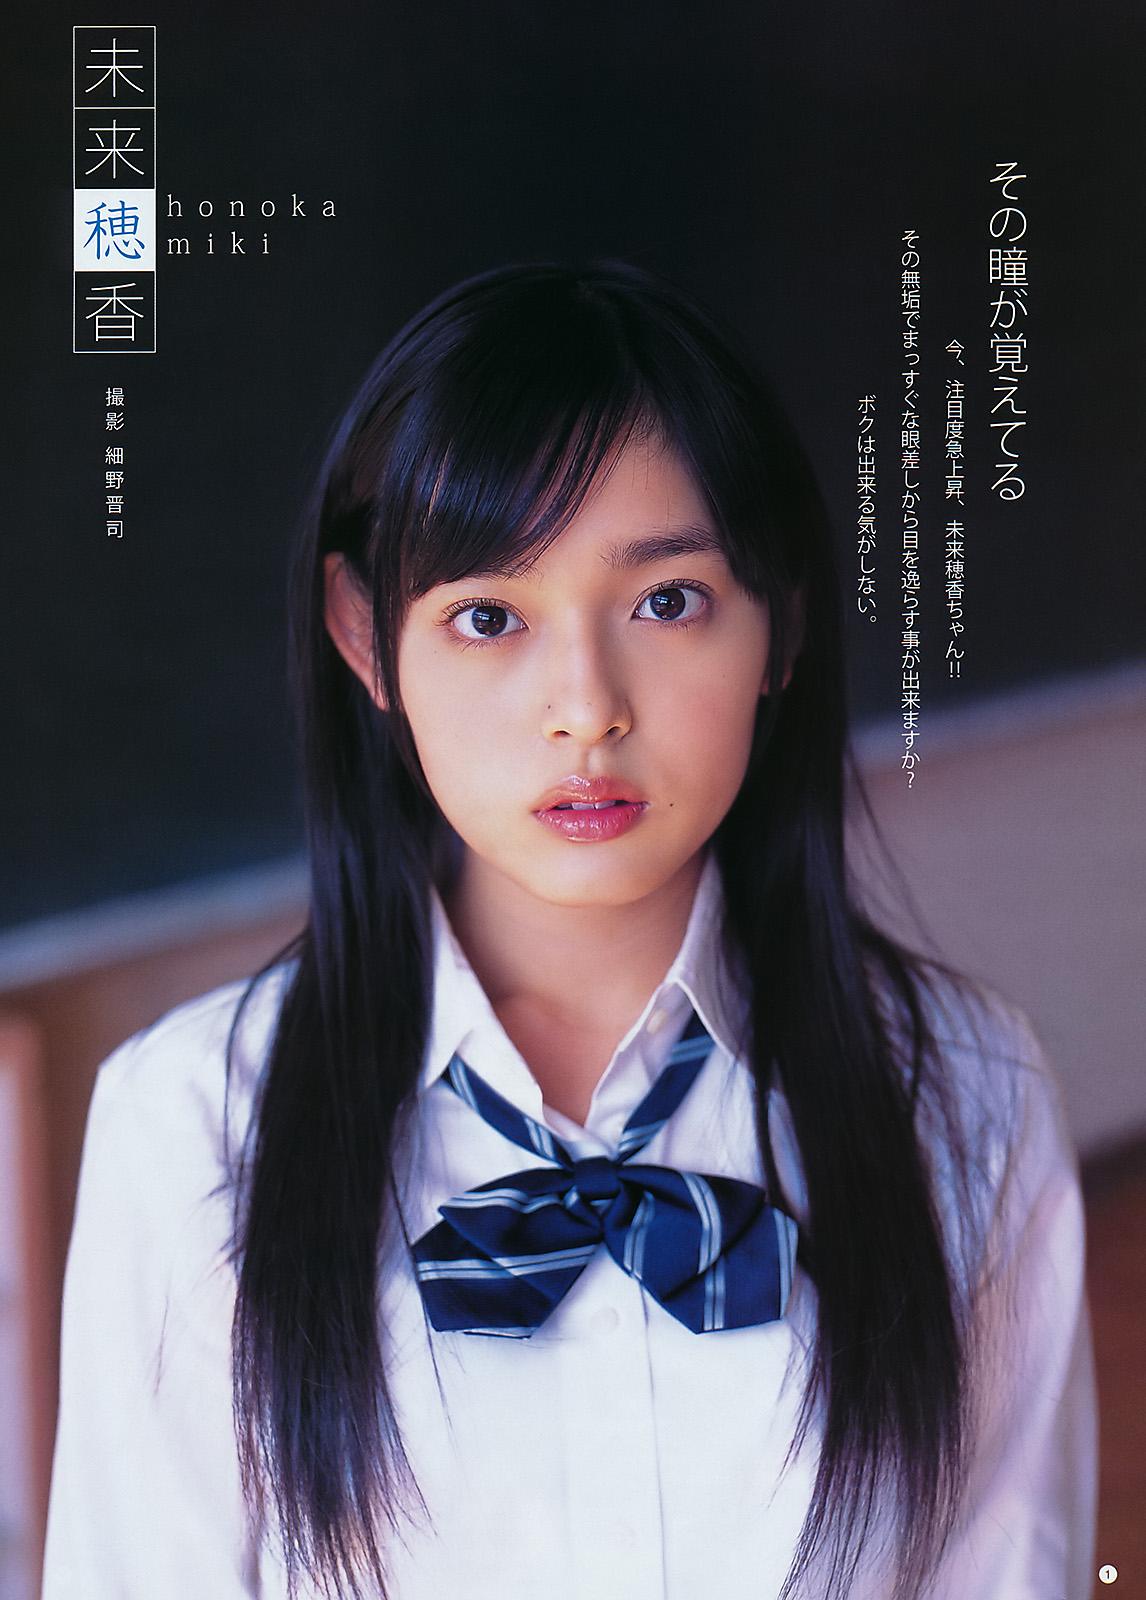 Itazura na kiss love in tokyo Drama jepang terbaru 2013